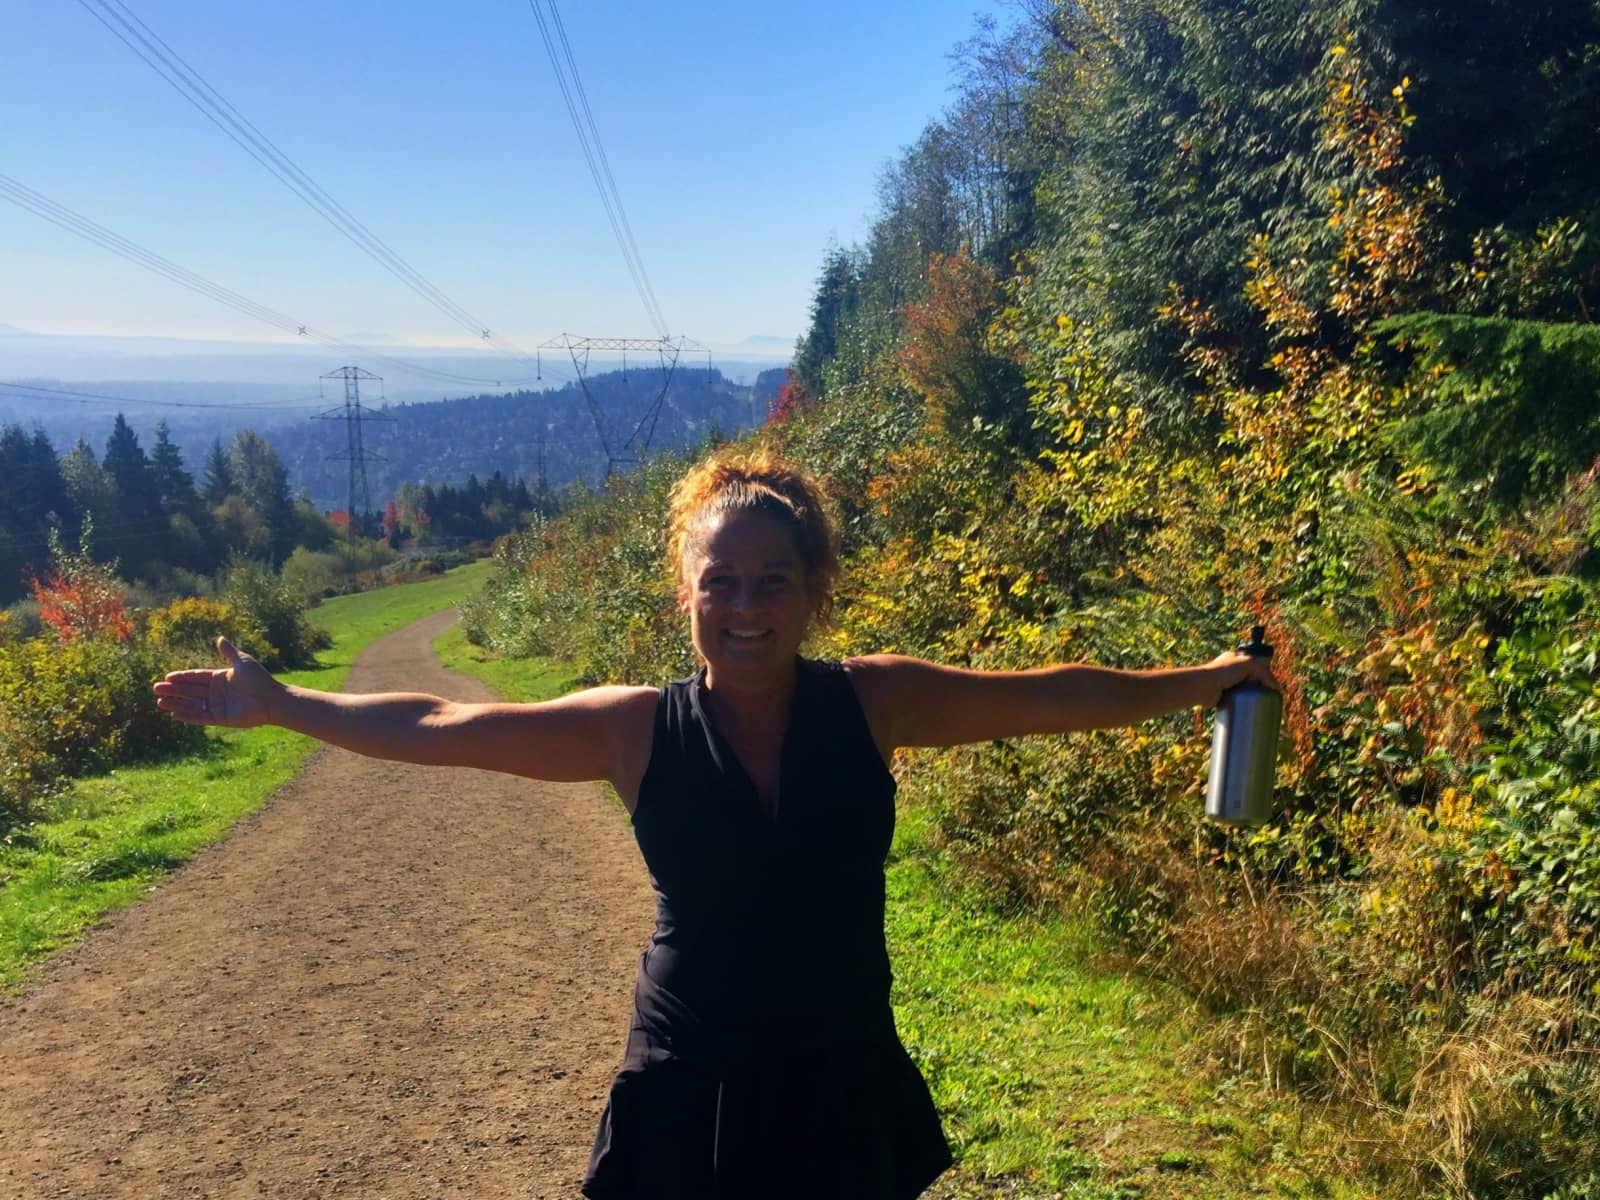 Shelley from Kelowna, British Columbia, Canada